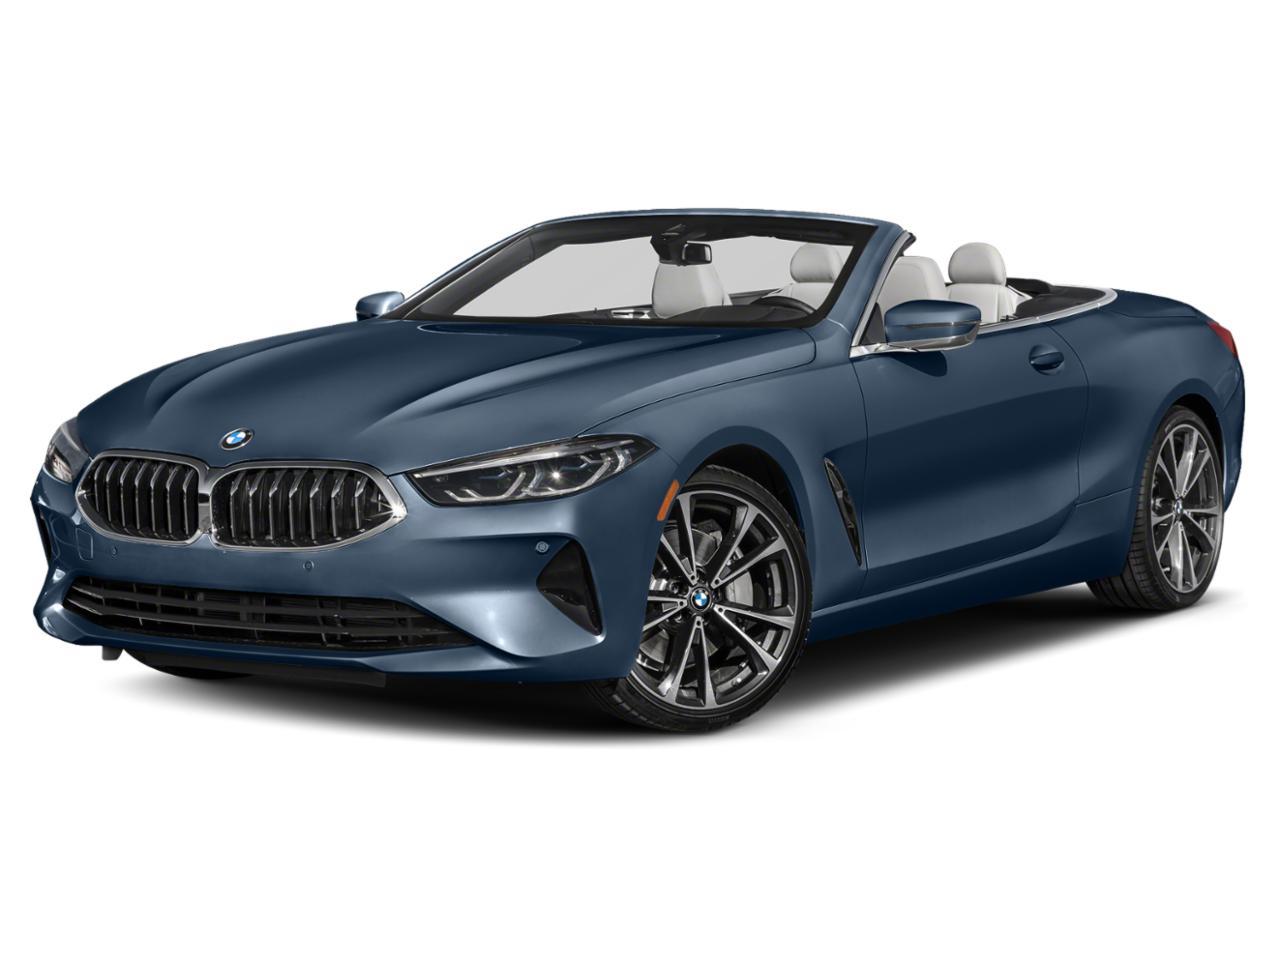 2020 BMW 840i Vehicle Photo in Pleasanton, CA 94588